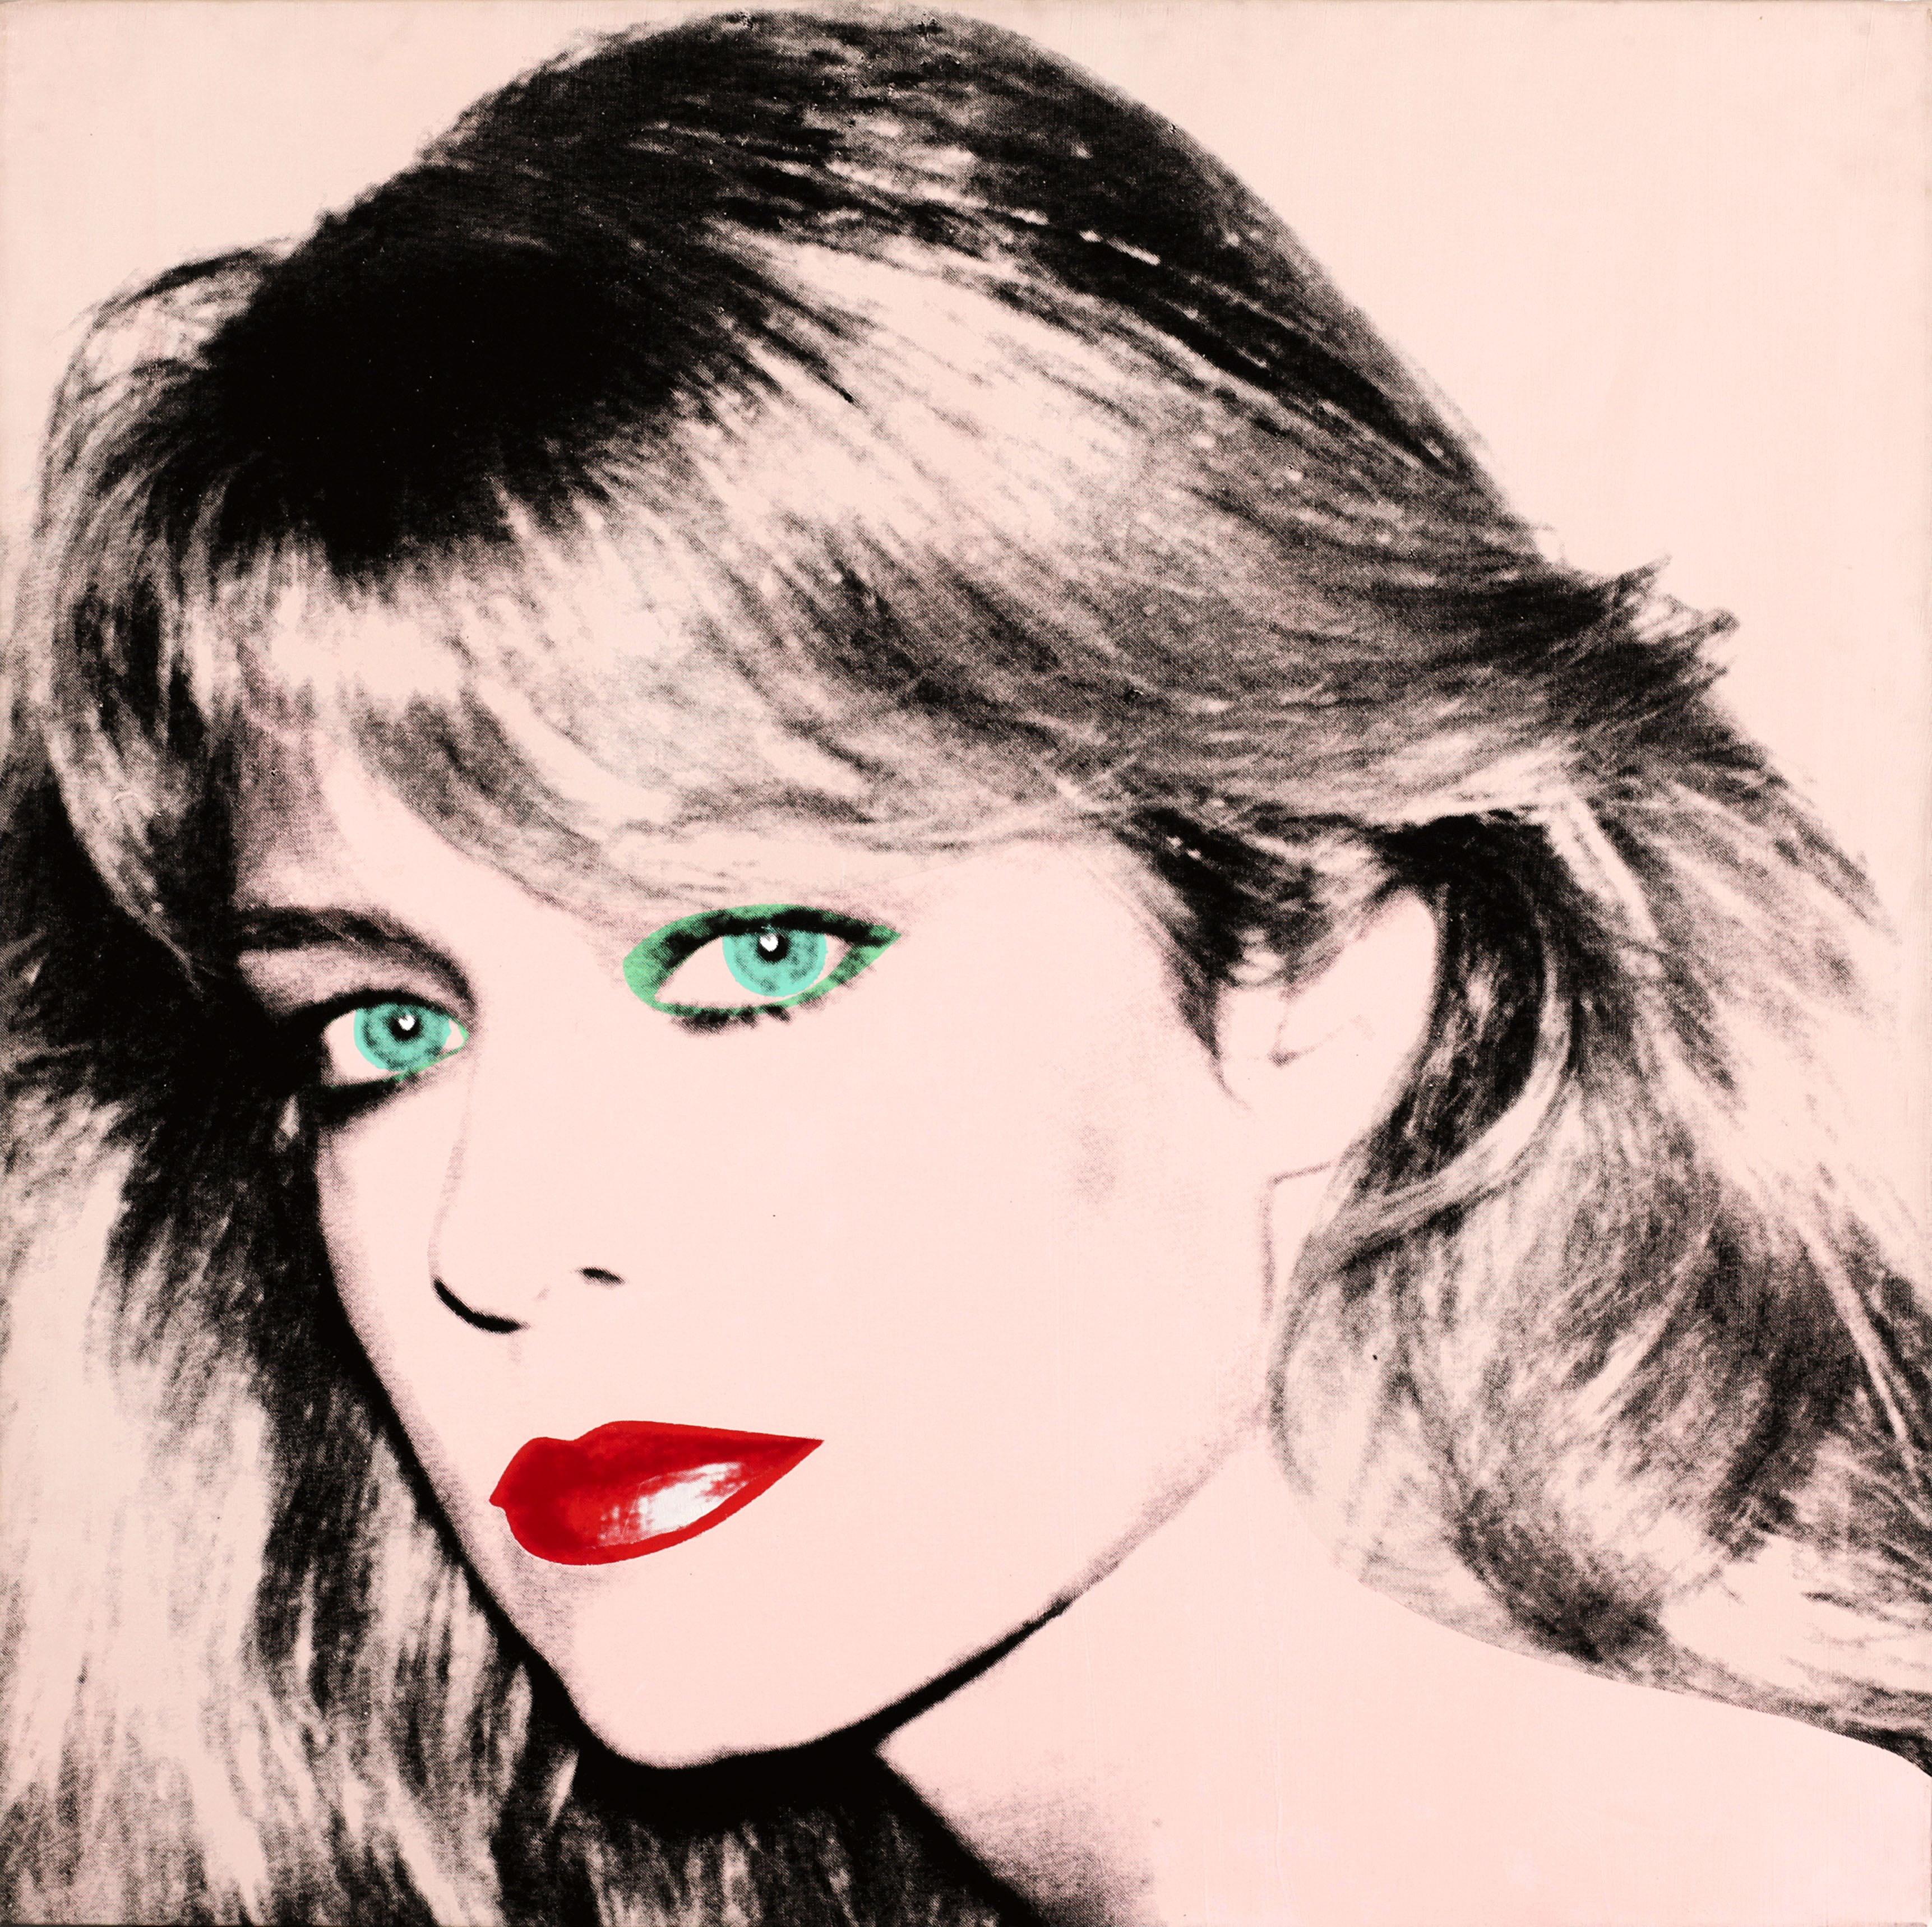 Farrah Fawcett Andy Warhol